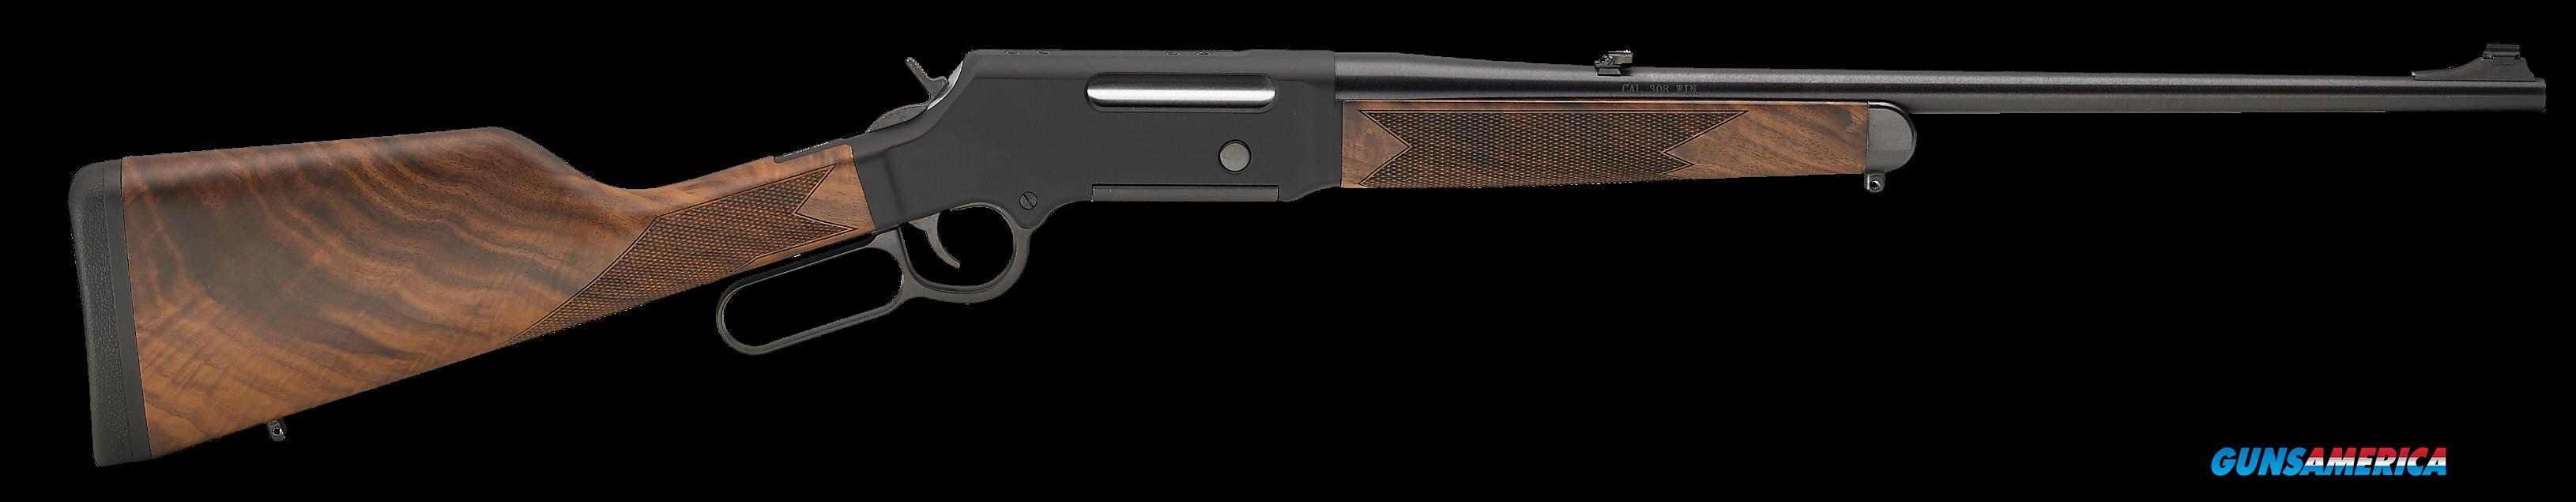 Henry Long Ranger, Henry H014s308  Long Ranger 308 Sights  Guns > Pistols > 1911 Pistol Copies (non-Colt)